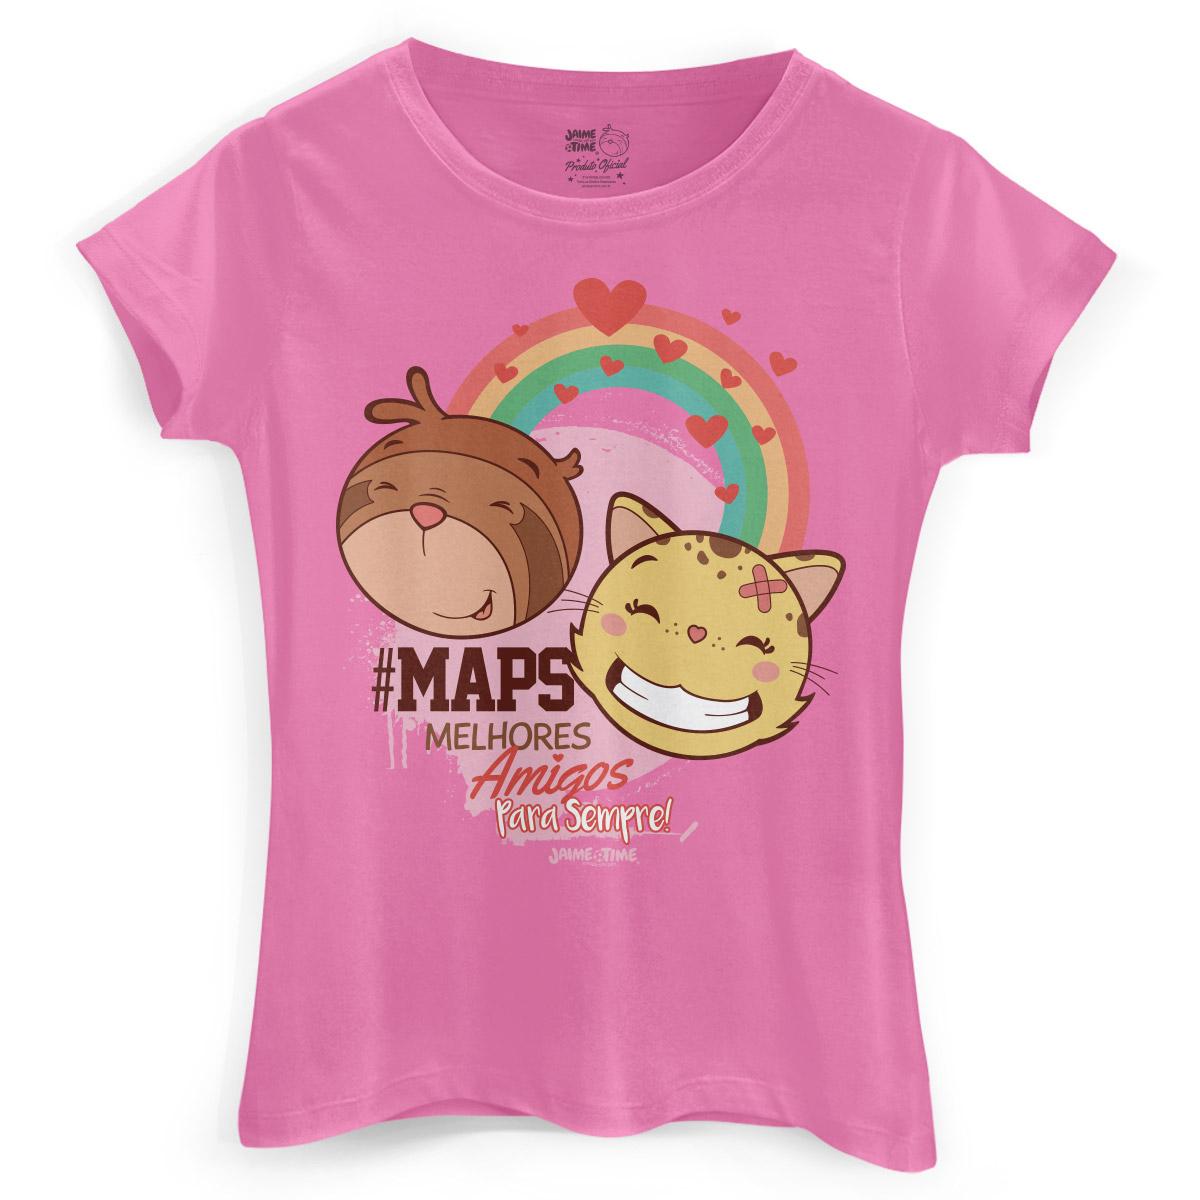 Camiseta Feminina Jaime #Maps